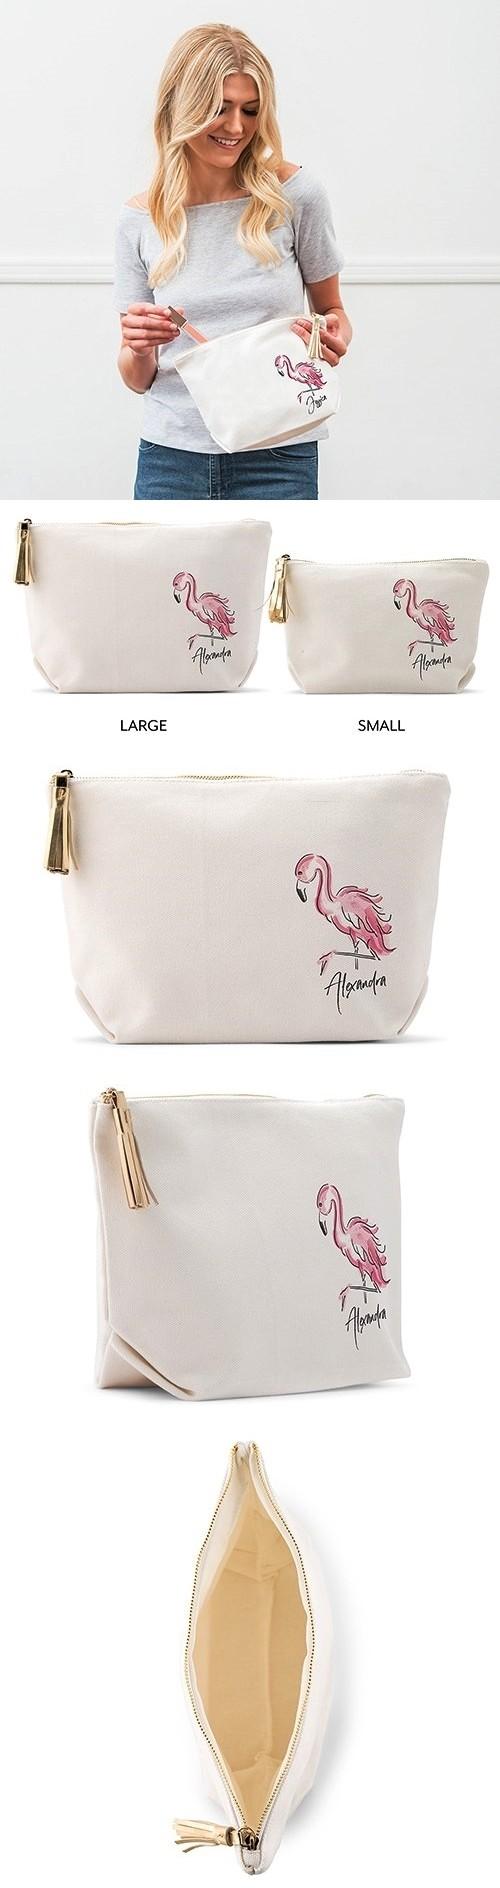 Weddingstar Personalized White Canvas Makeup Bag - Flamingo Design